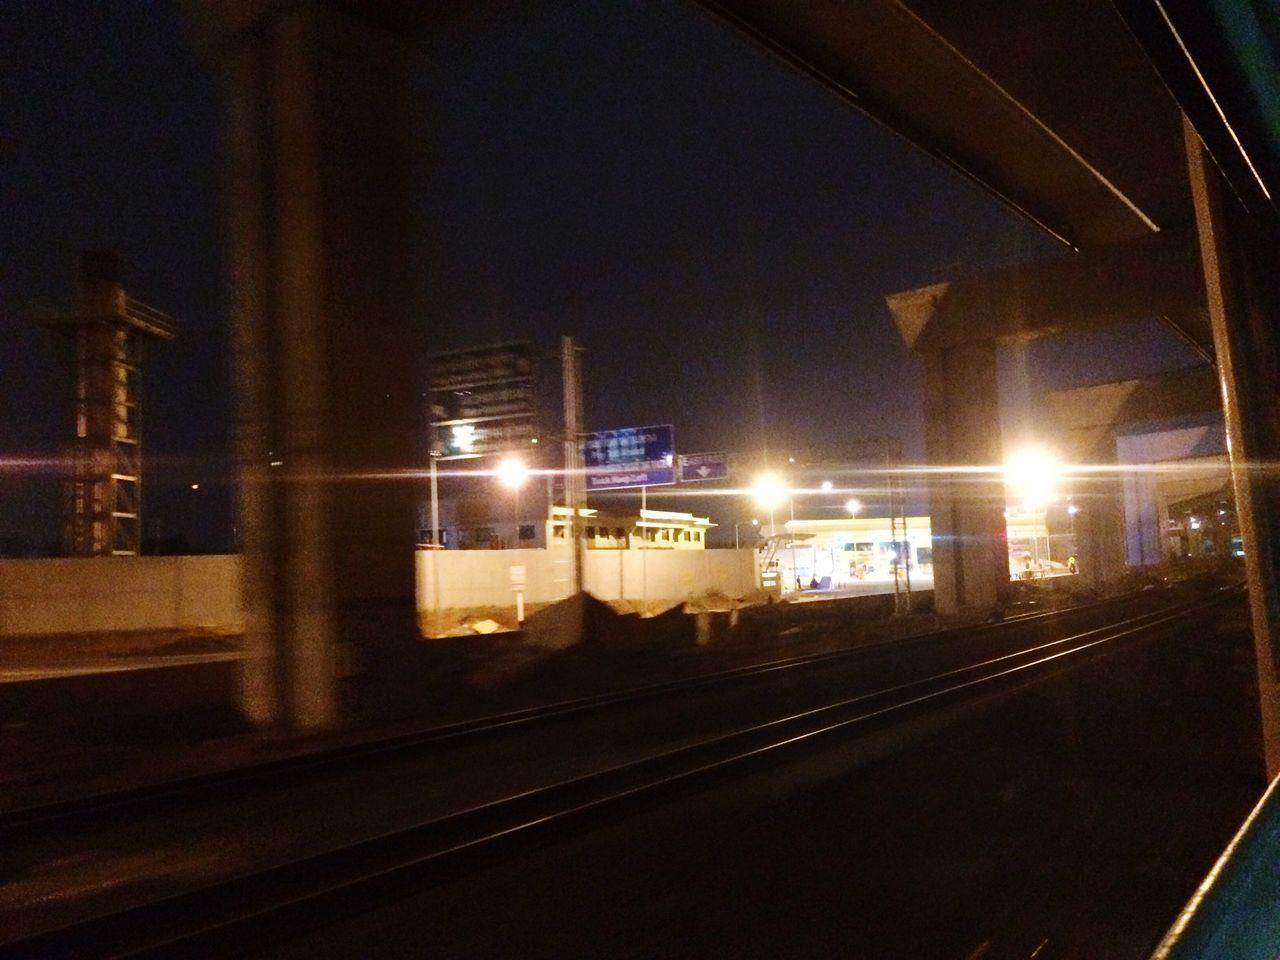 illuminated, night, rail transportation, railroad track, transportation, public transportation, train - vehicle, railroad station, railroad station platform, built structure, no people, architecture, indoors, city, sky